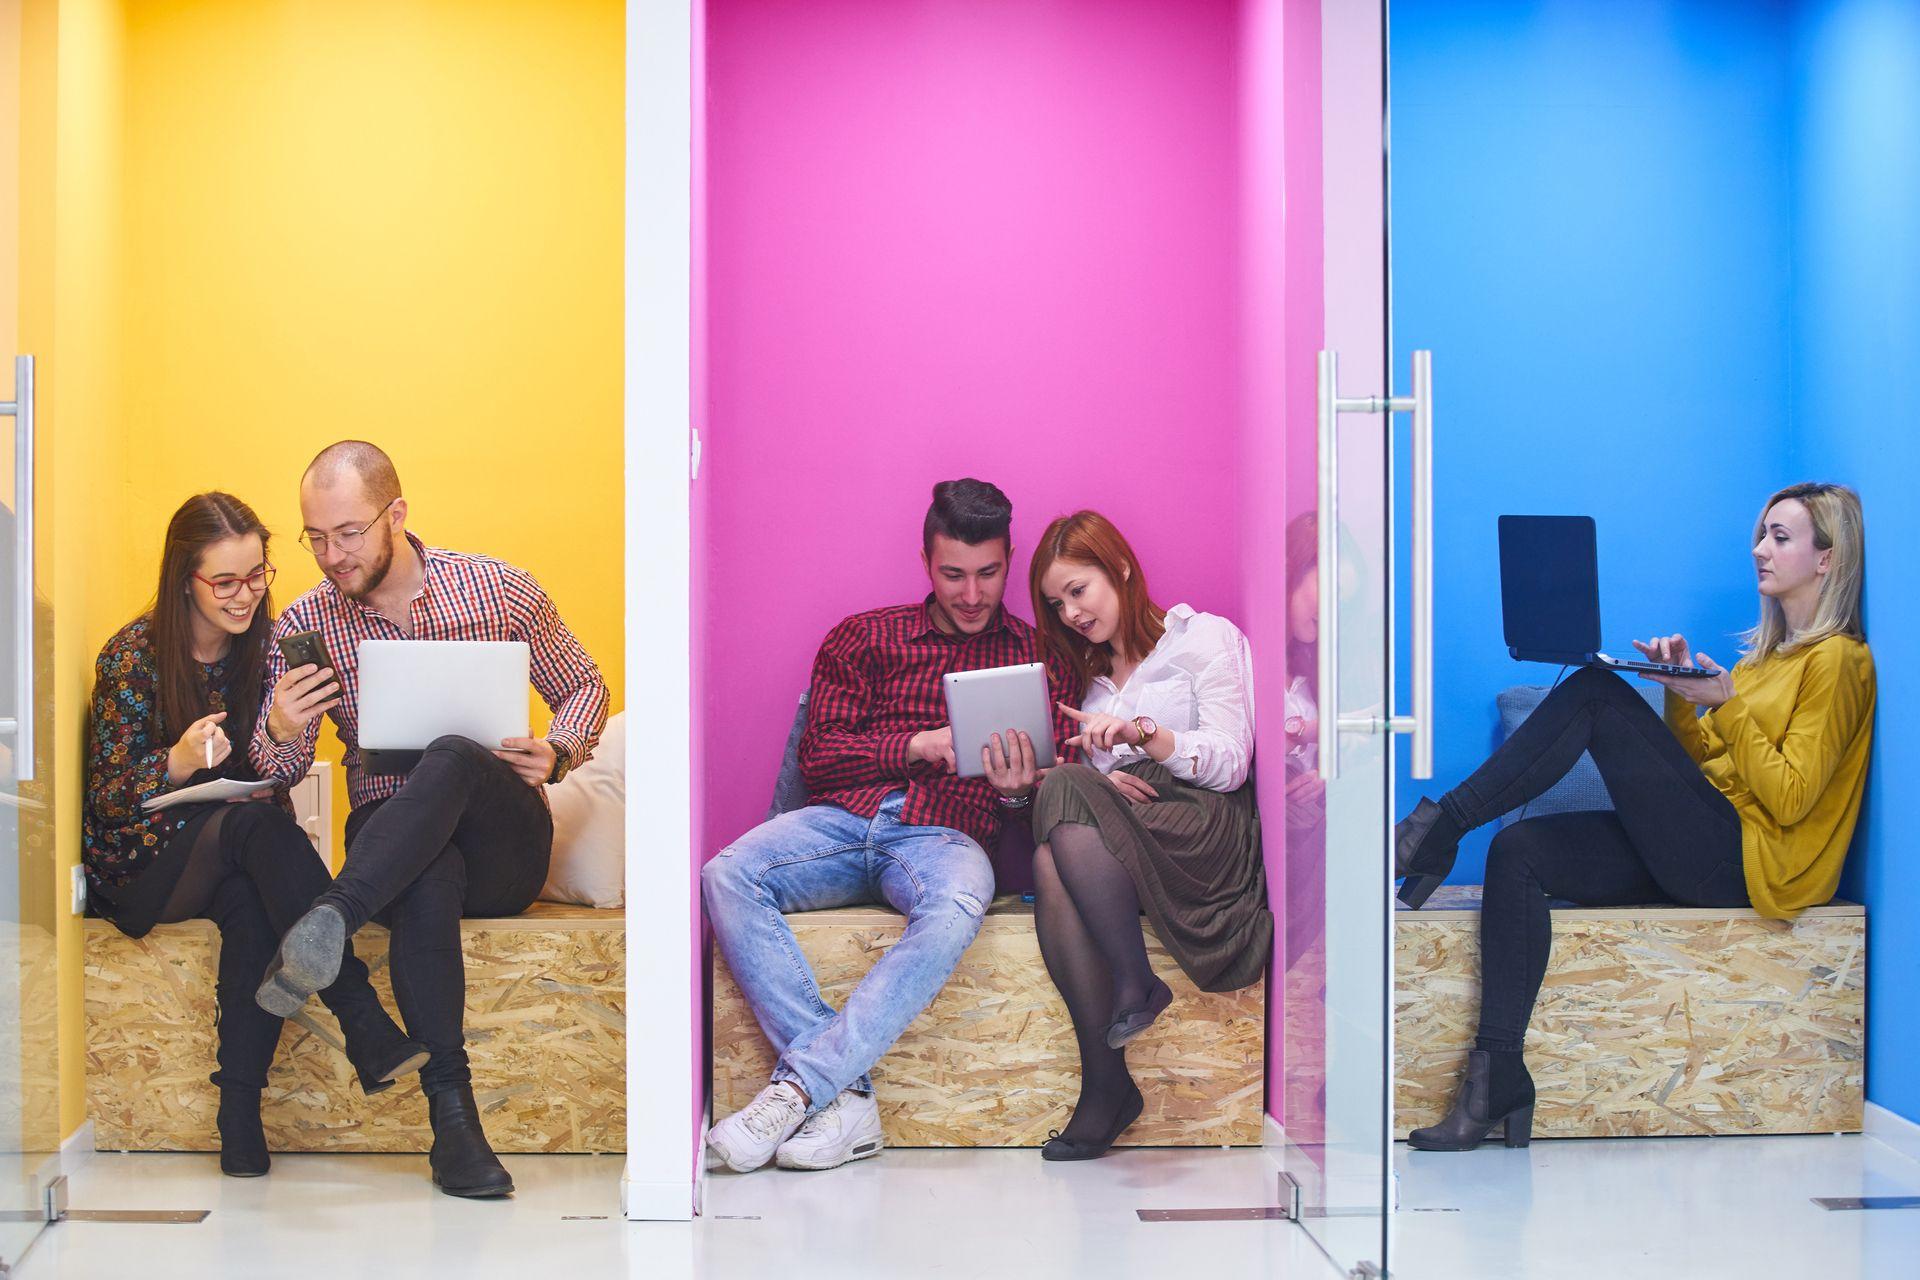 modern workplace mobil arbeiten